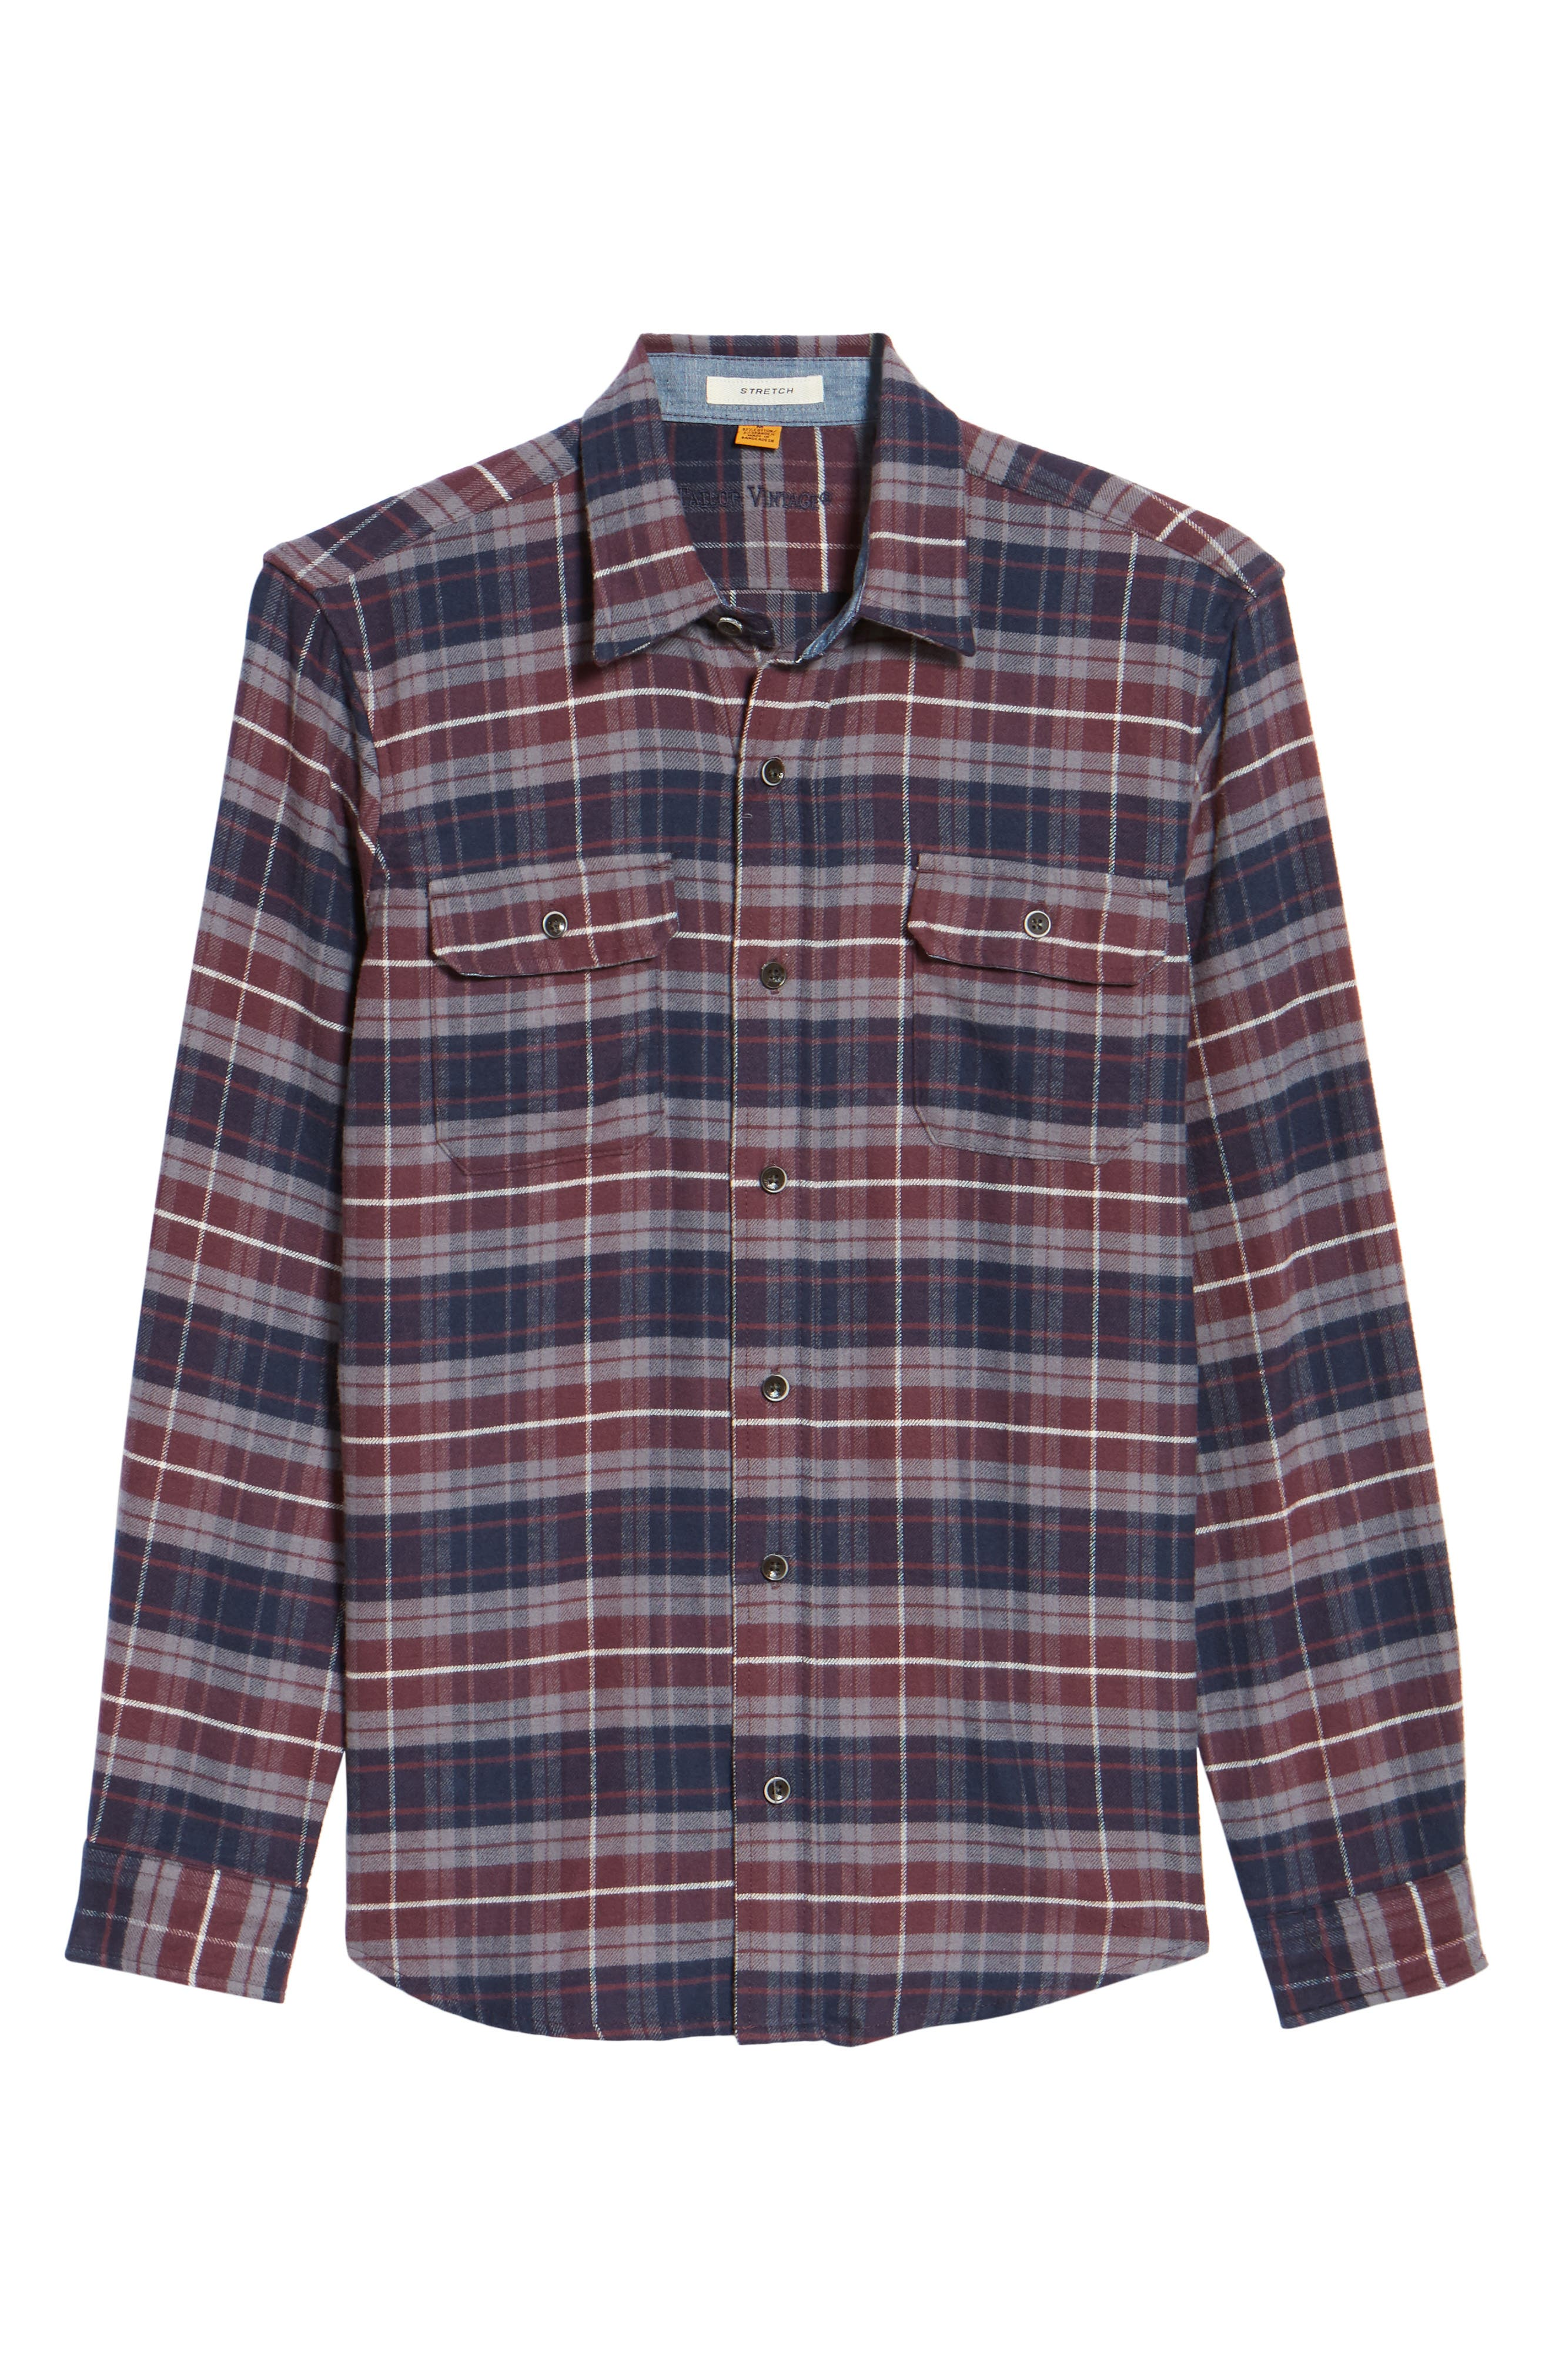 Plaid Flannel Sport Shirt,                             Alternate thumbnail 6, color,                             Raspberry Fudge Trail Plaid